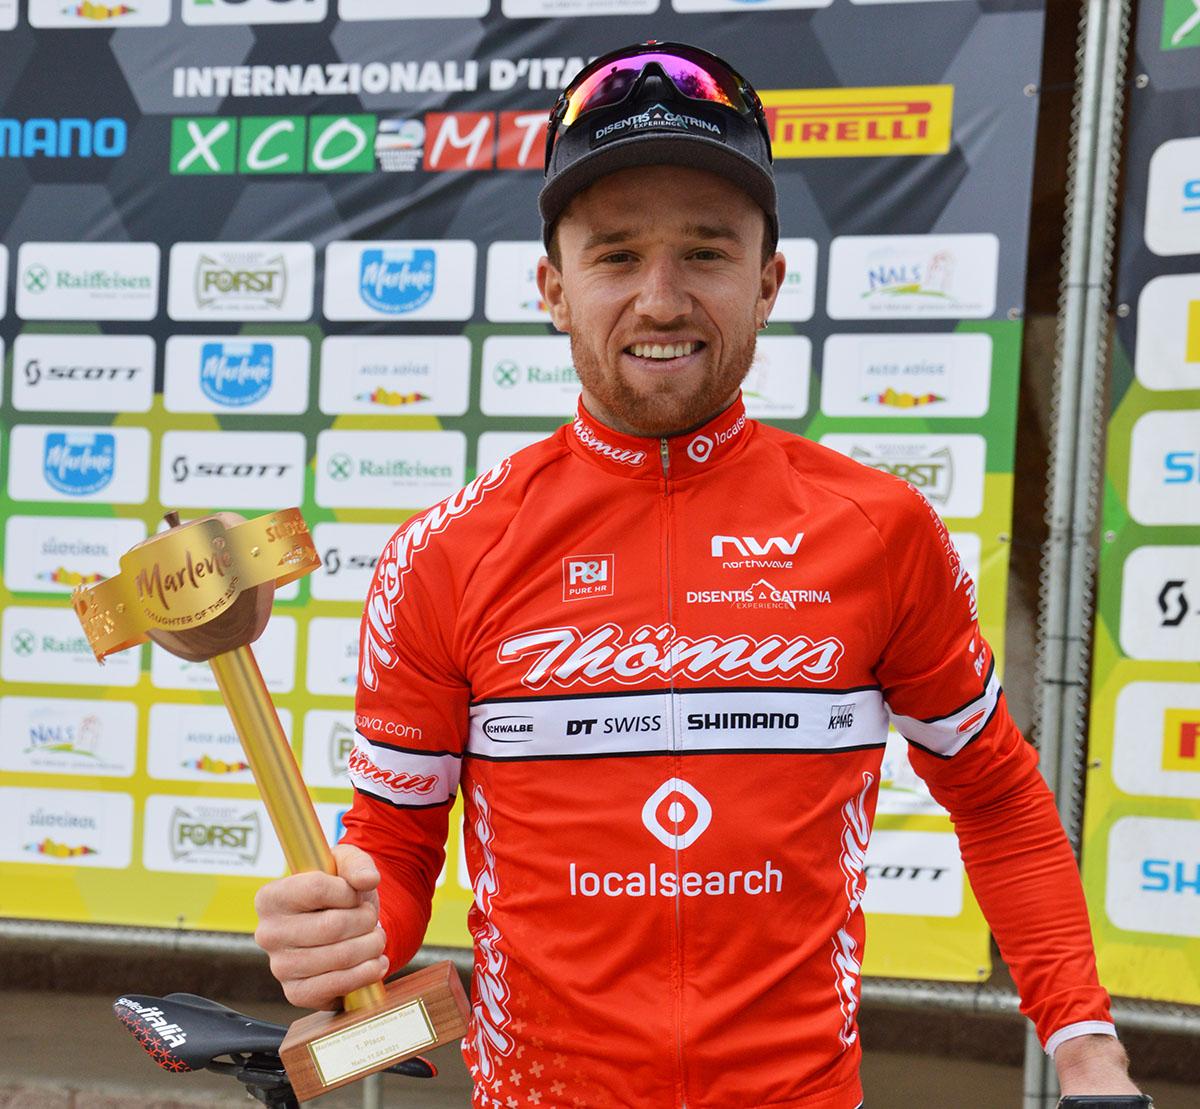 Mathias Flückiger con il trofeo della Marlene Sudtirol Sunshine Race